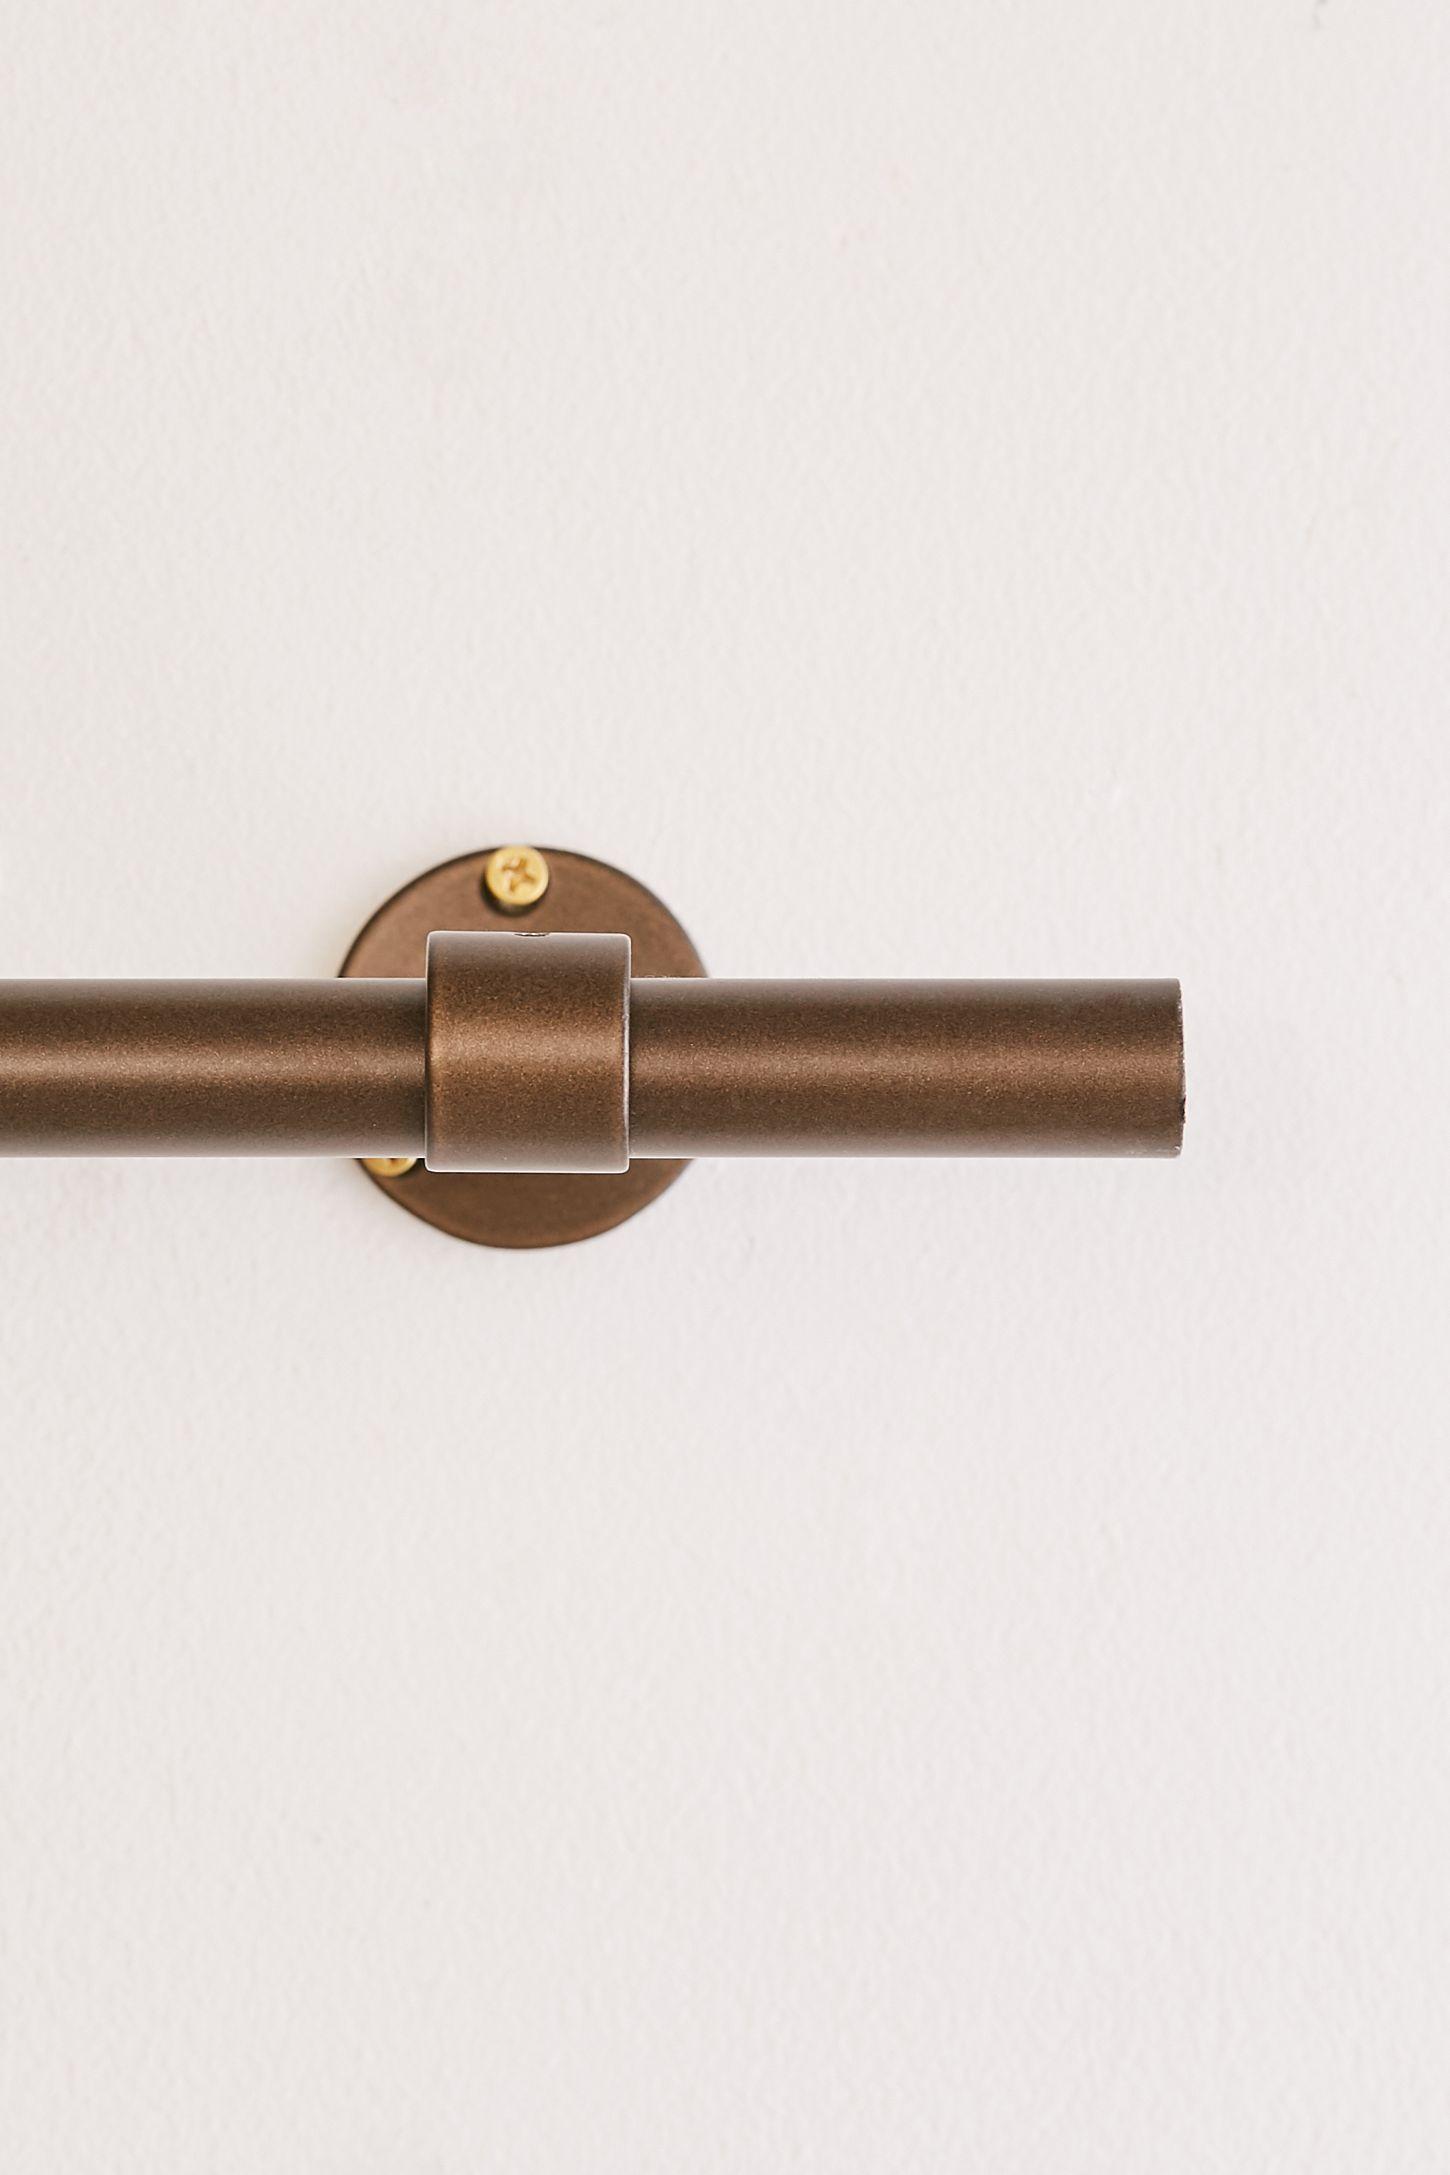 catalog view s guthrie cm adjustable nickel curtain product umbra id usd single rod